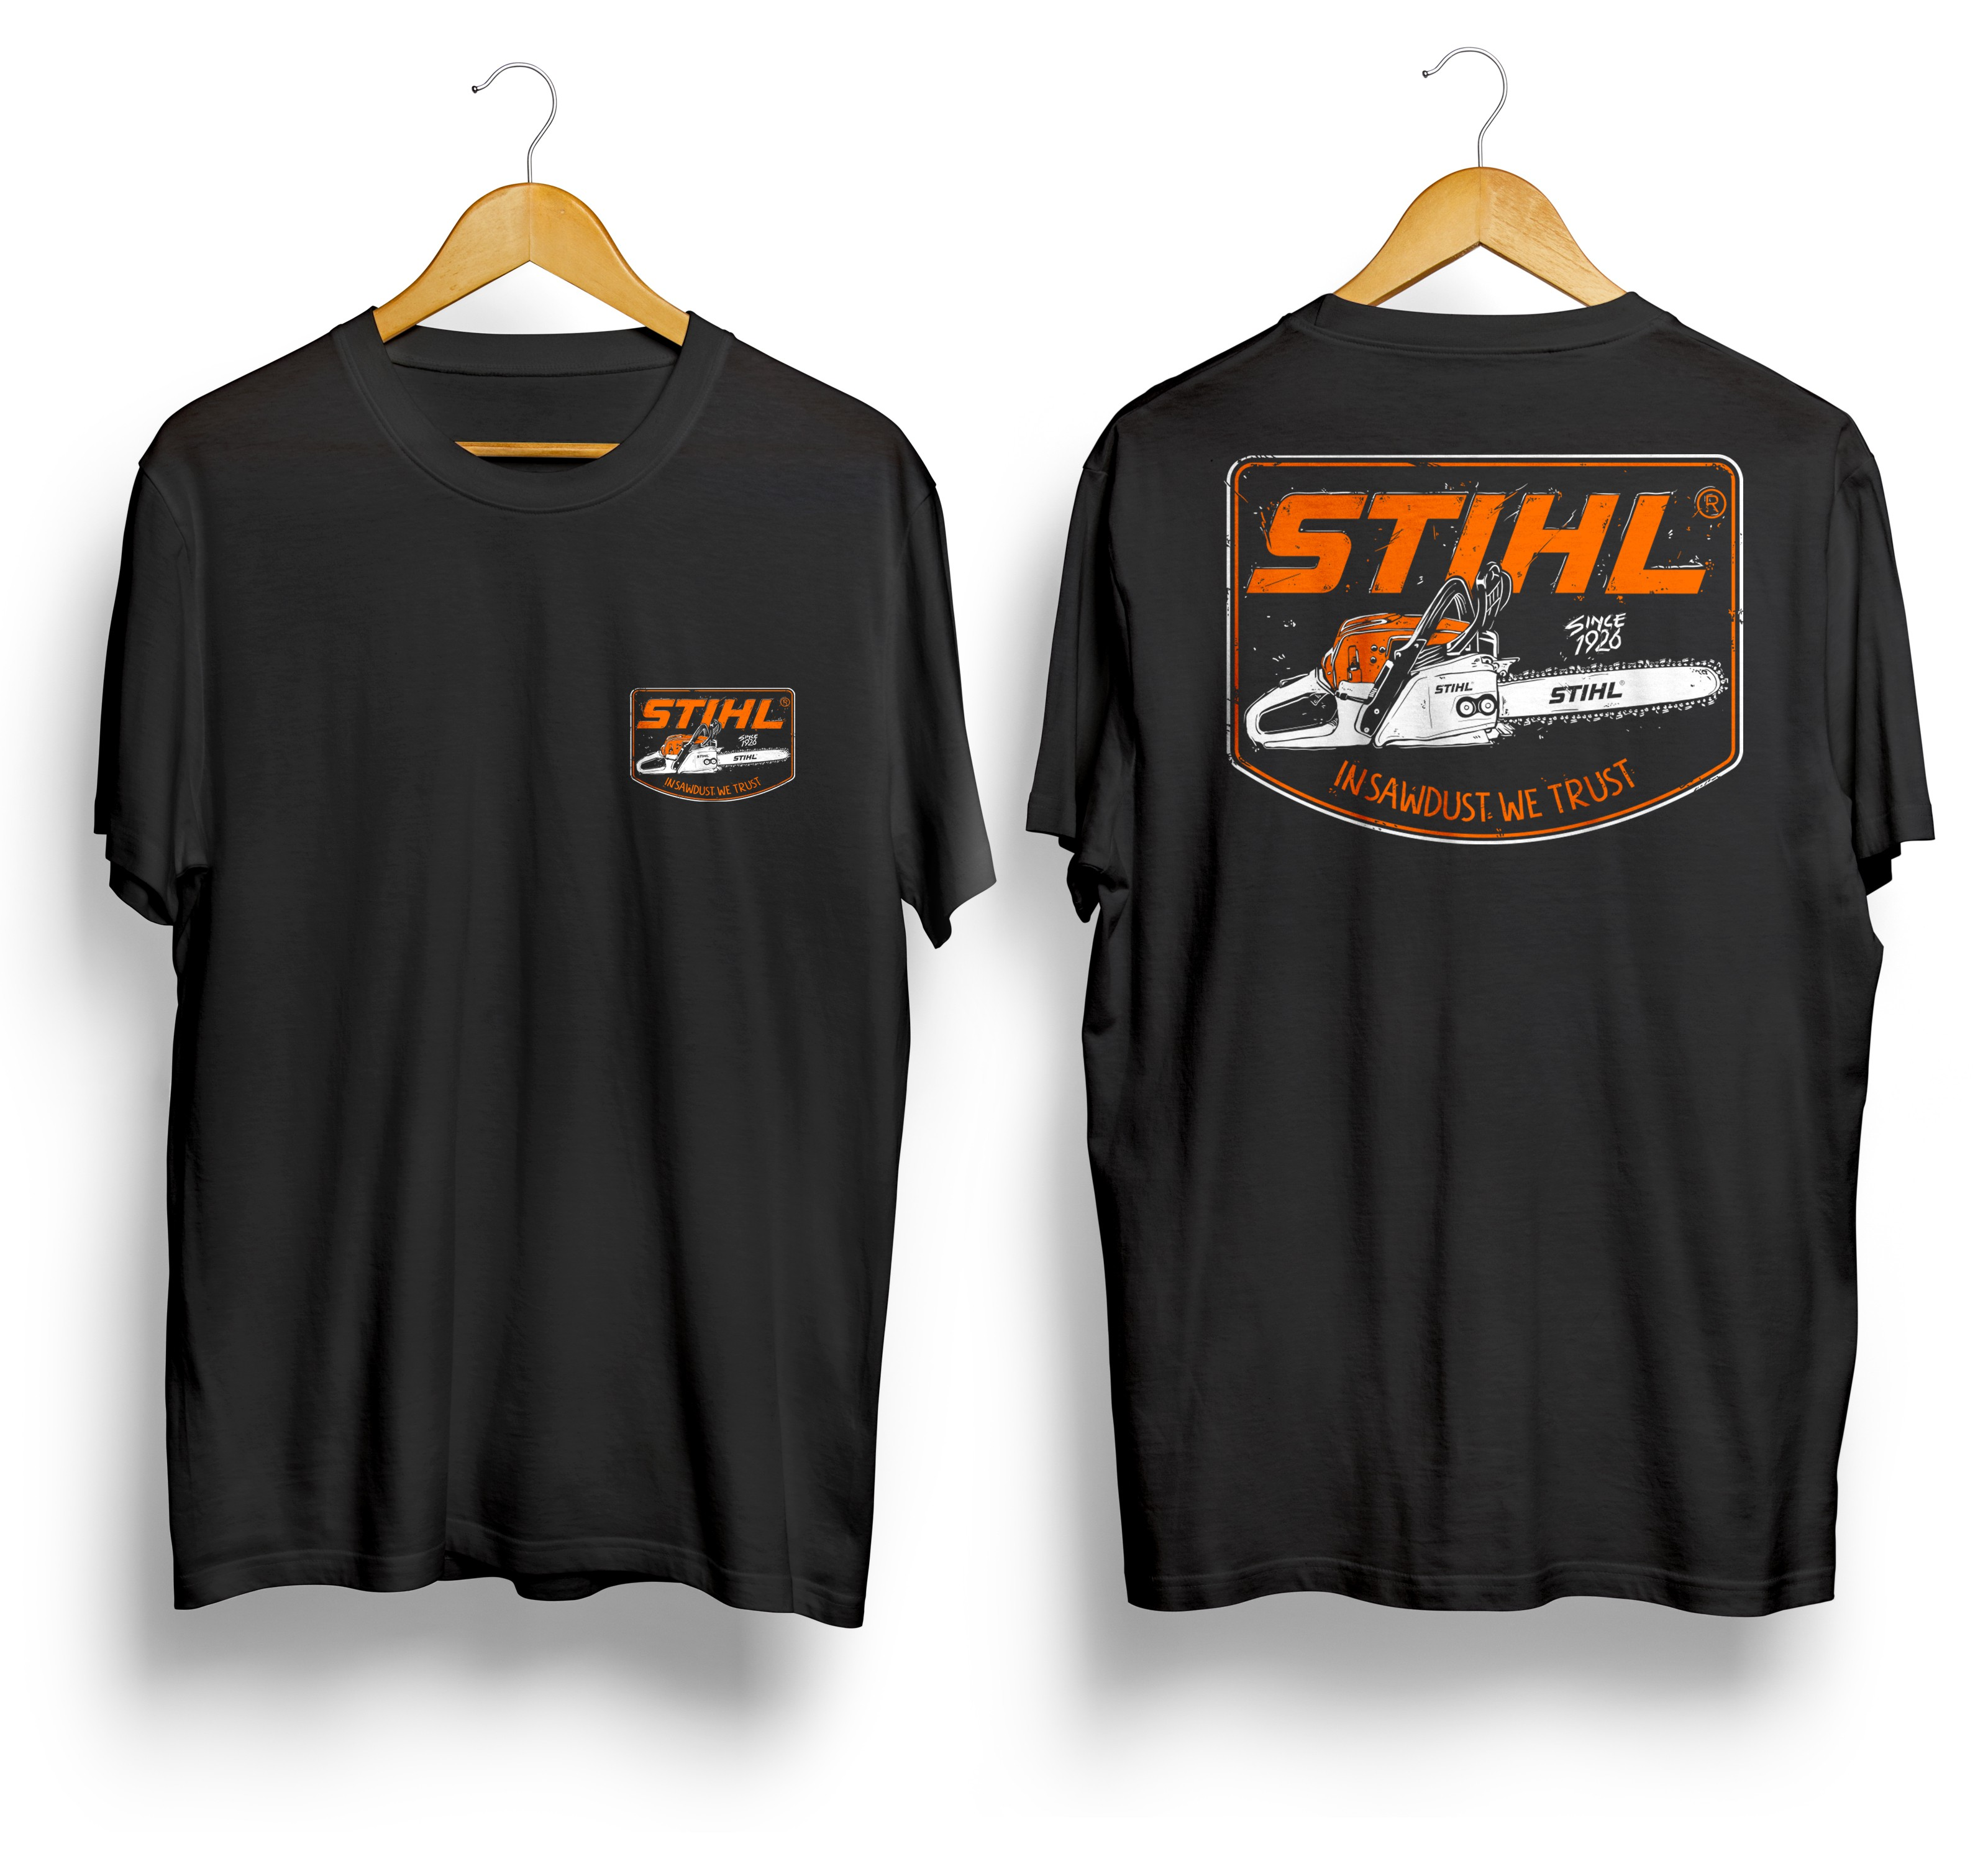 STIHL Ltd. Design